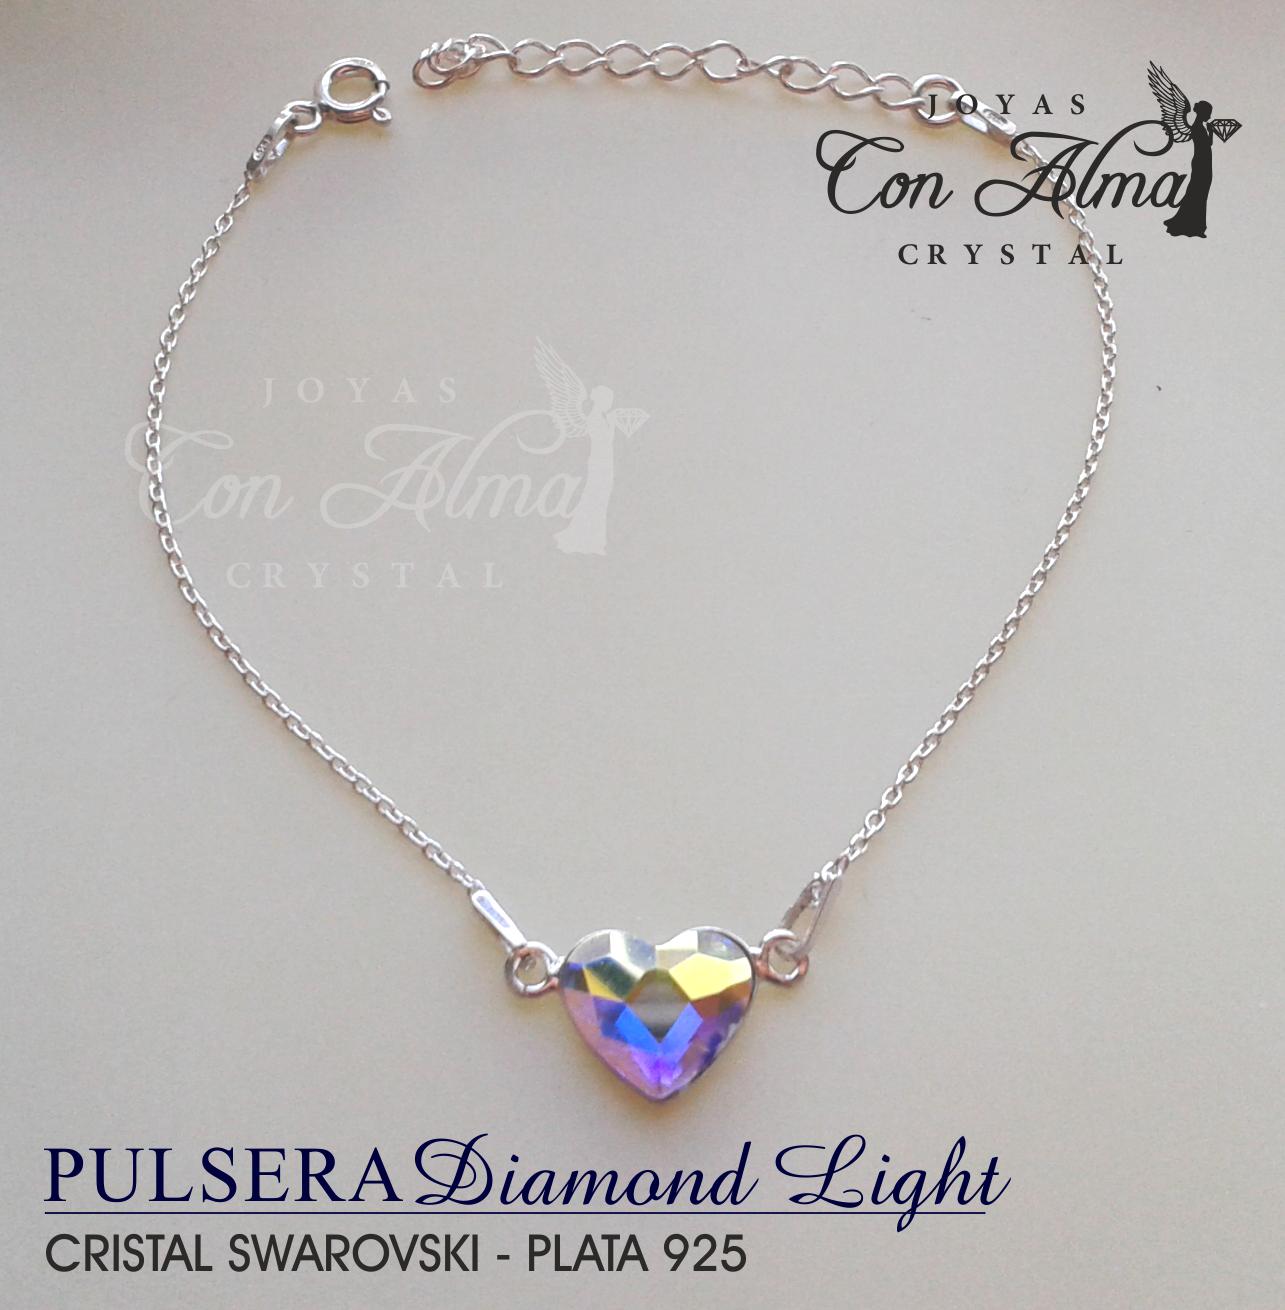 Pulsera Diamond light    26,99 €